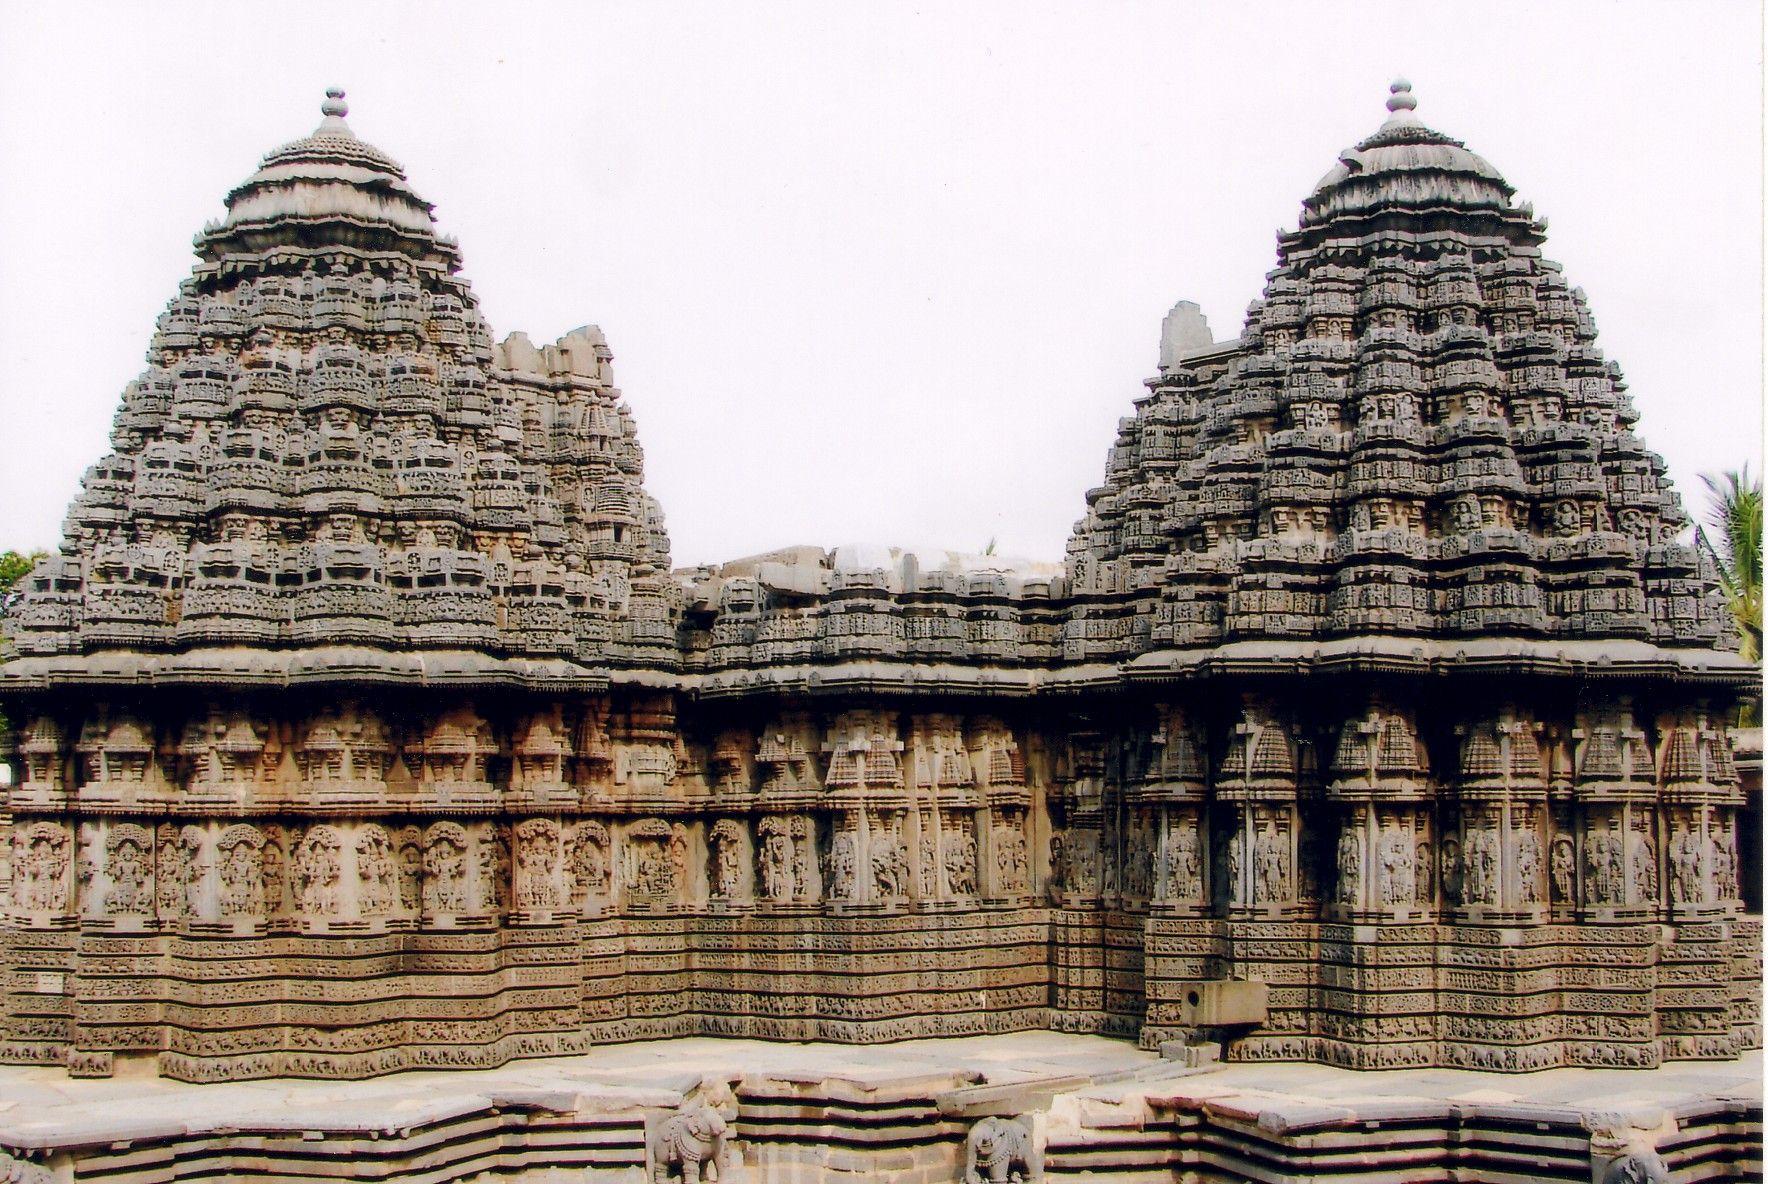 Keshava temple sikhara dravidian or vesara architecture style chaturanga pinterest temple hoysala and indian architecture